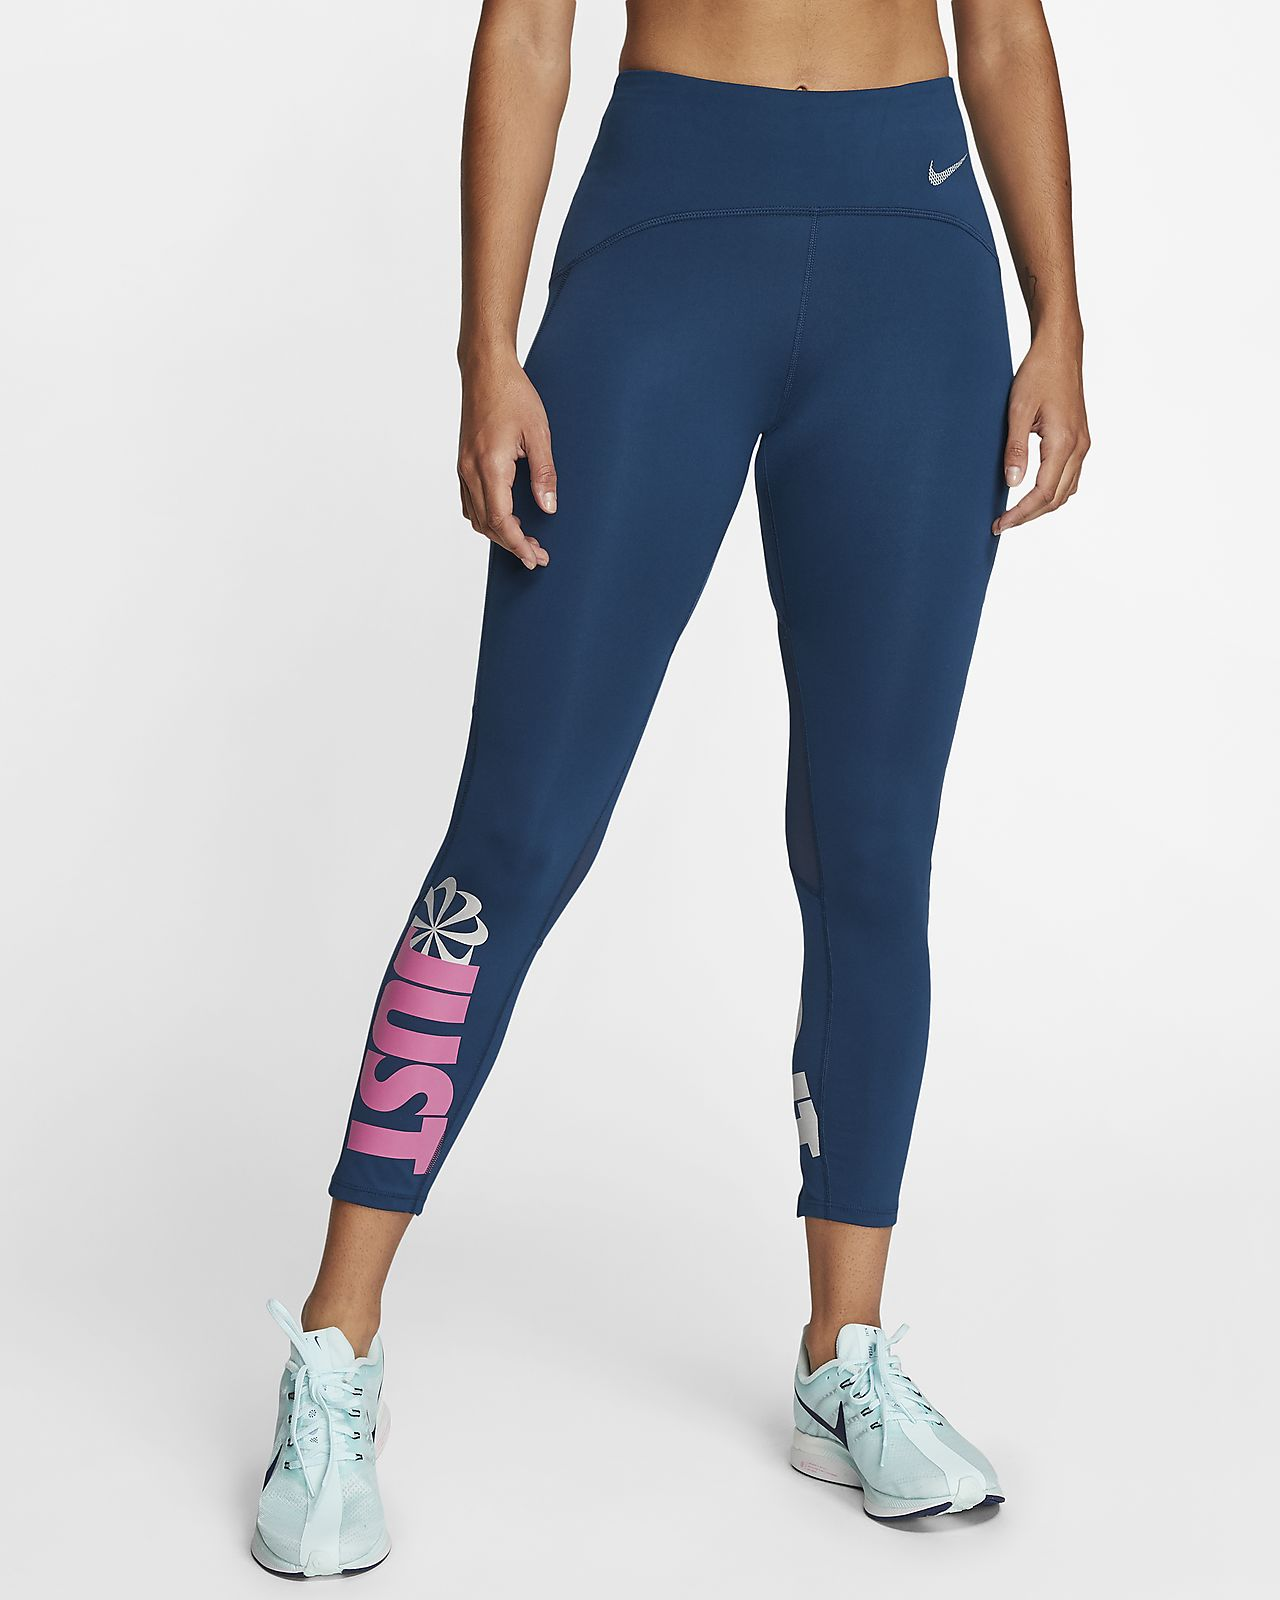 Nike Speed Icon Clash 7/8-os testhezálló női futónadrág